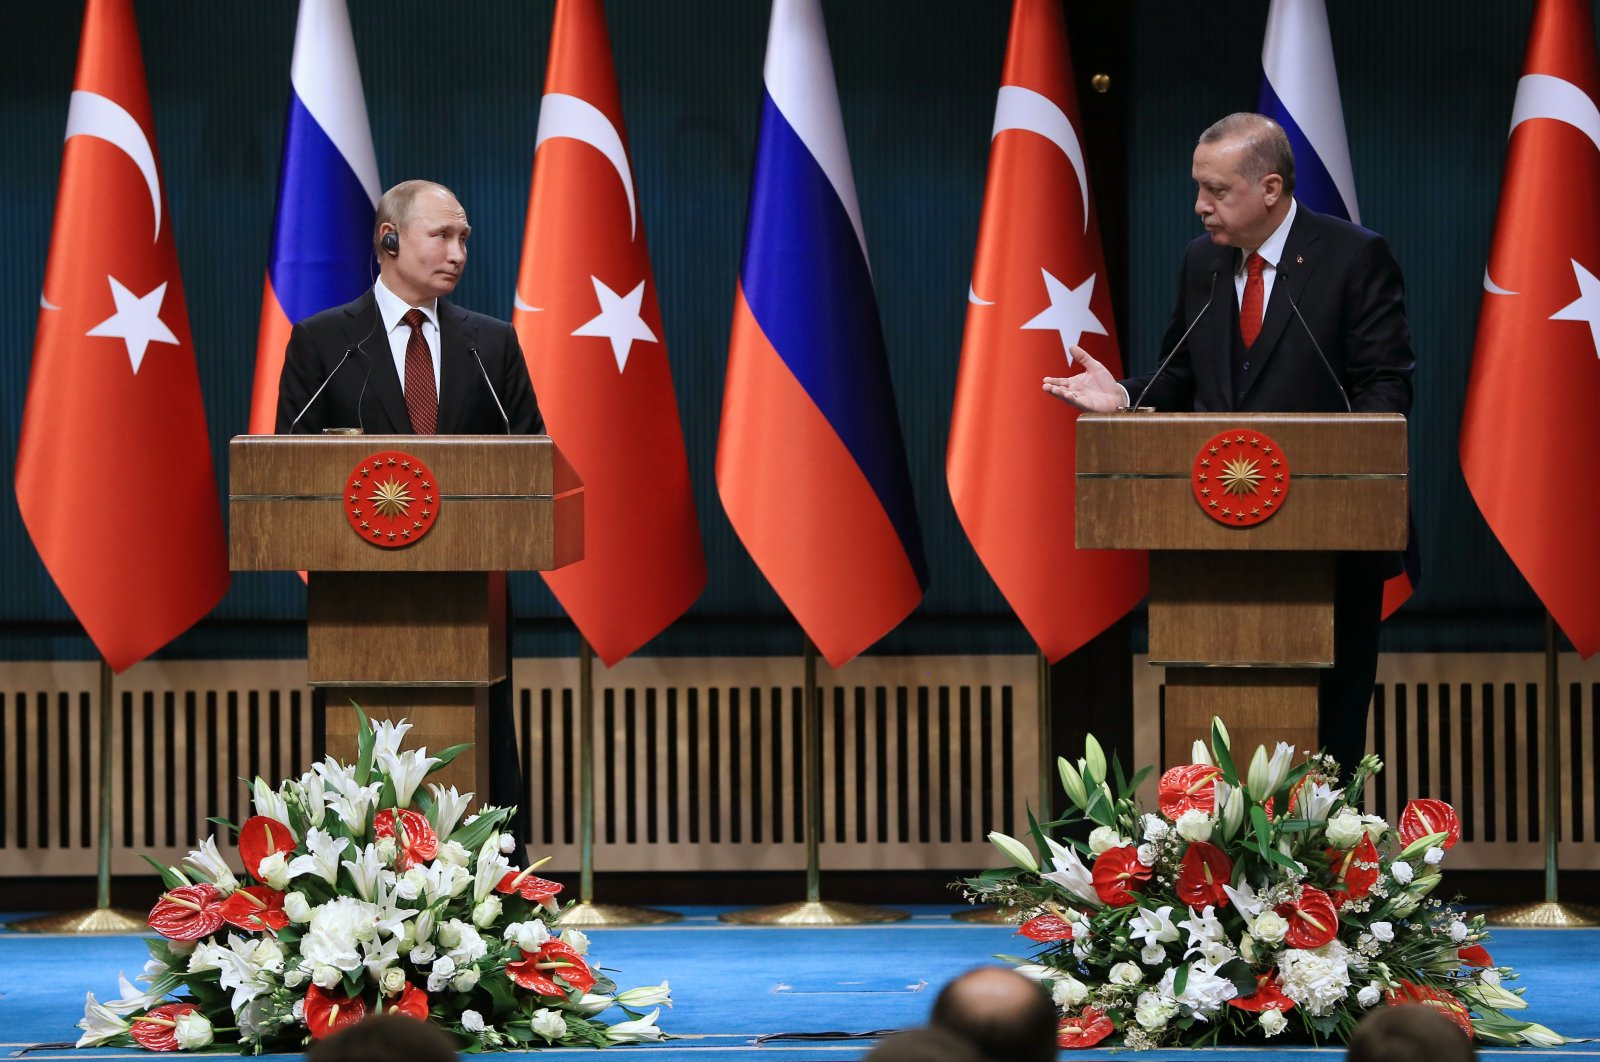 President Recep Tayyip Erdoğan (R) and Russian President Vladimir Putin in the capital Ankara, Turkey, April 3, 2018. (AA Photo).